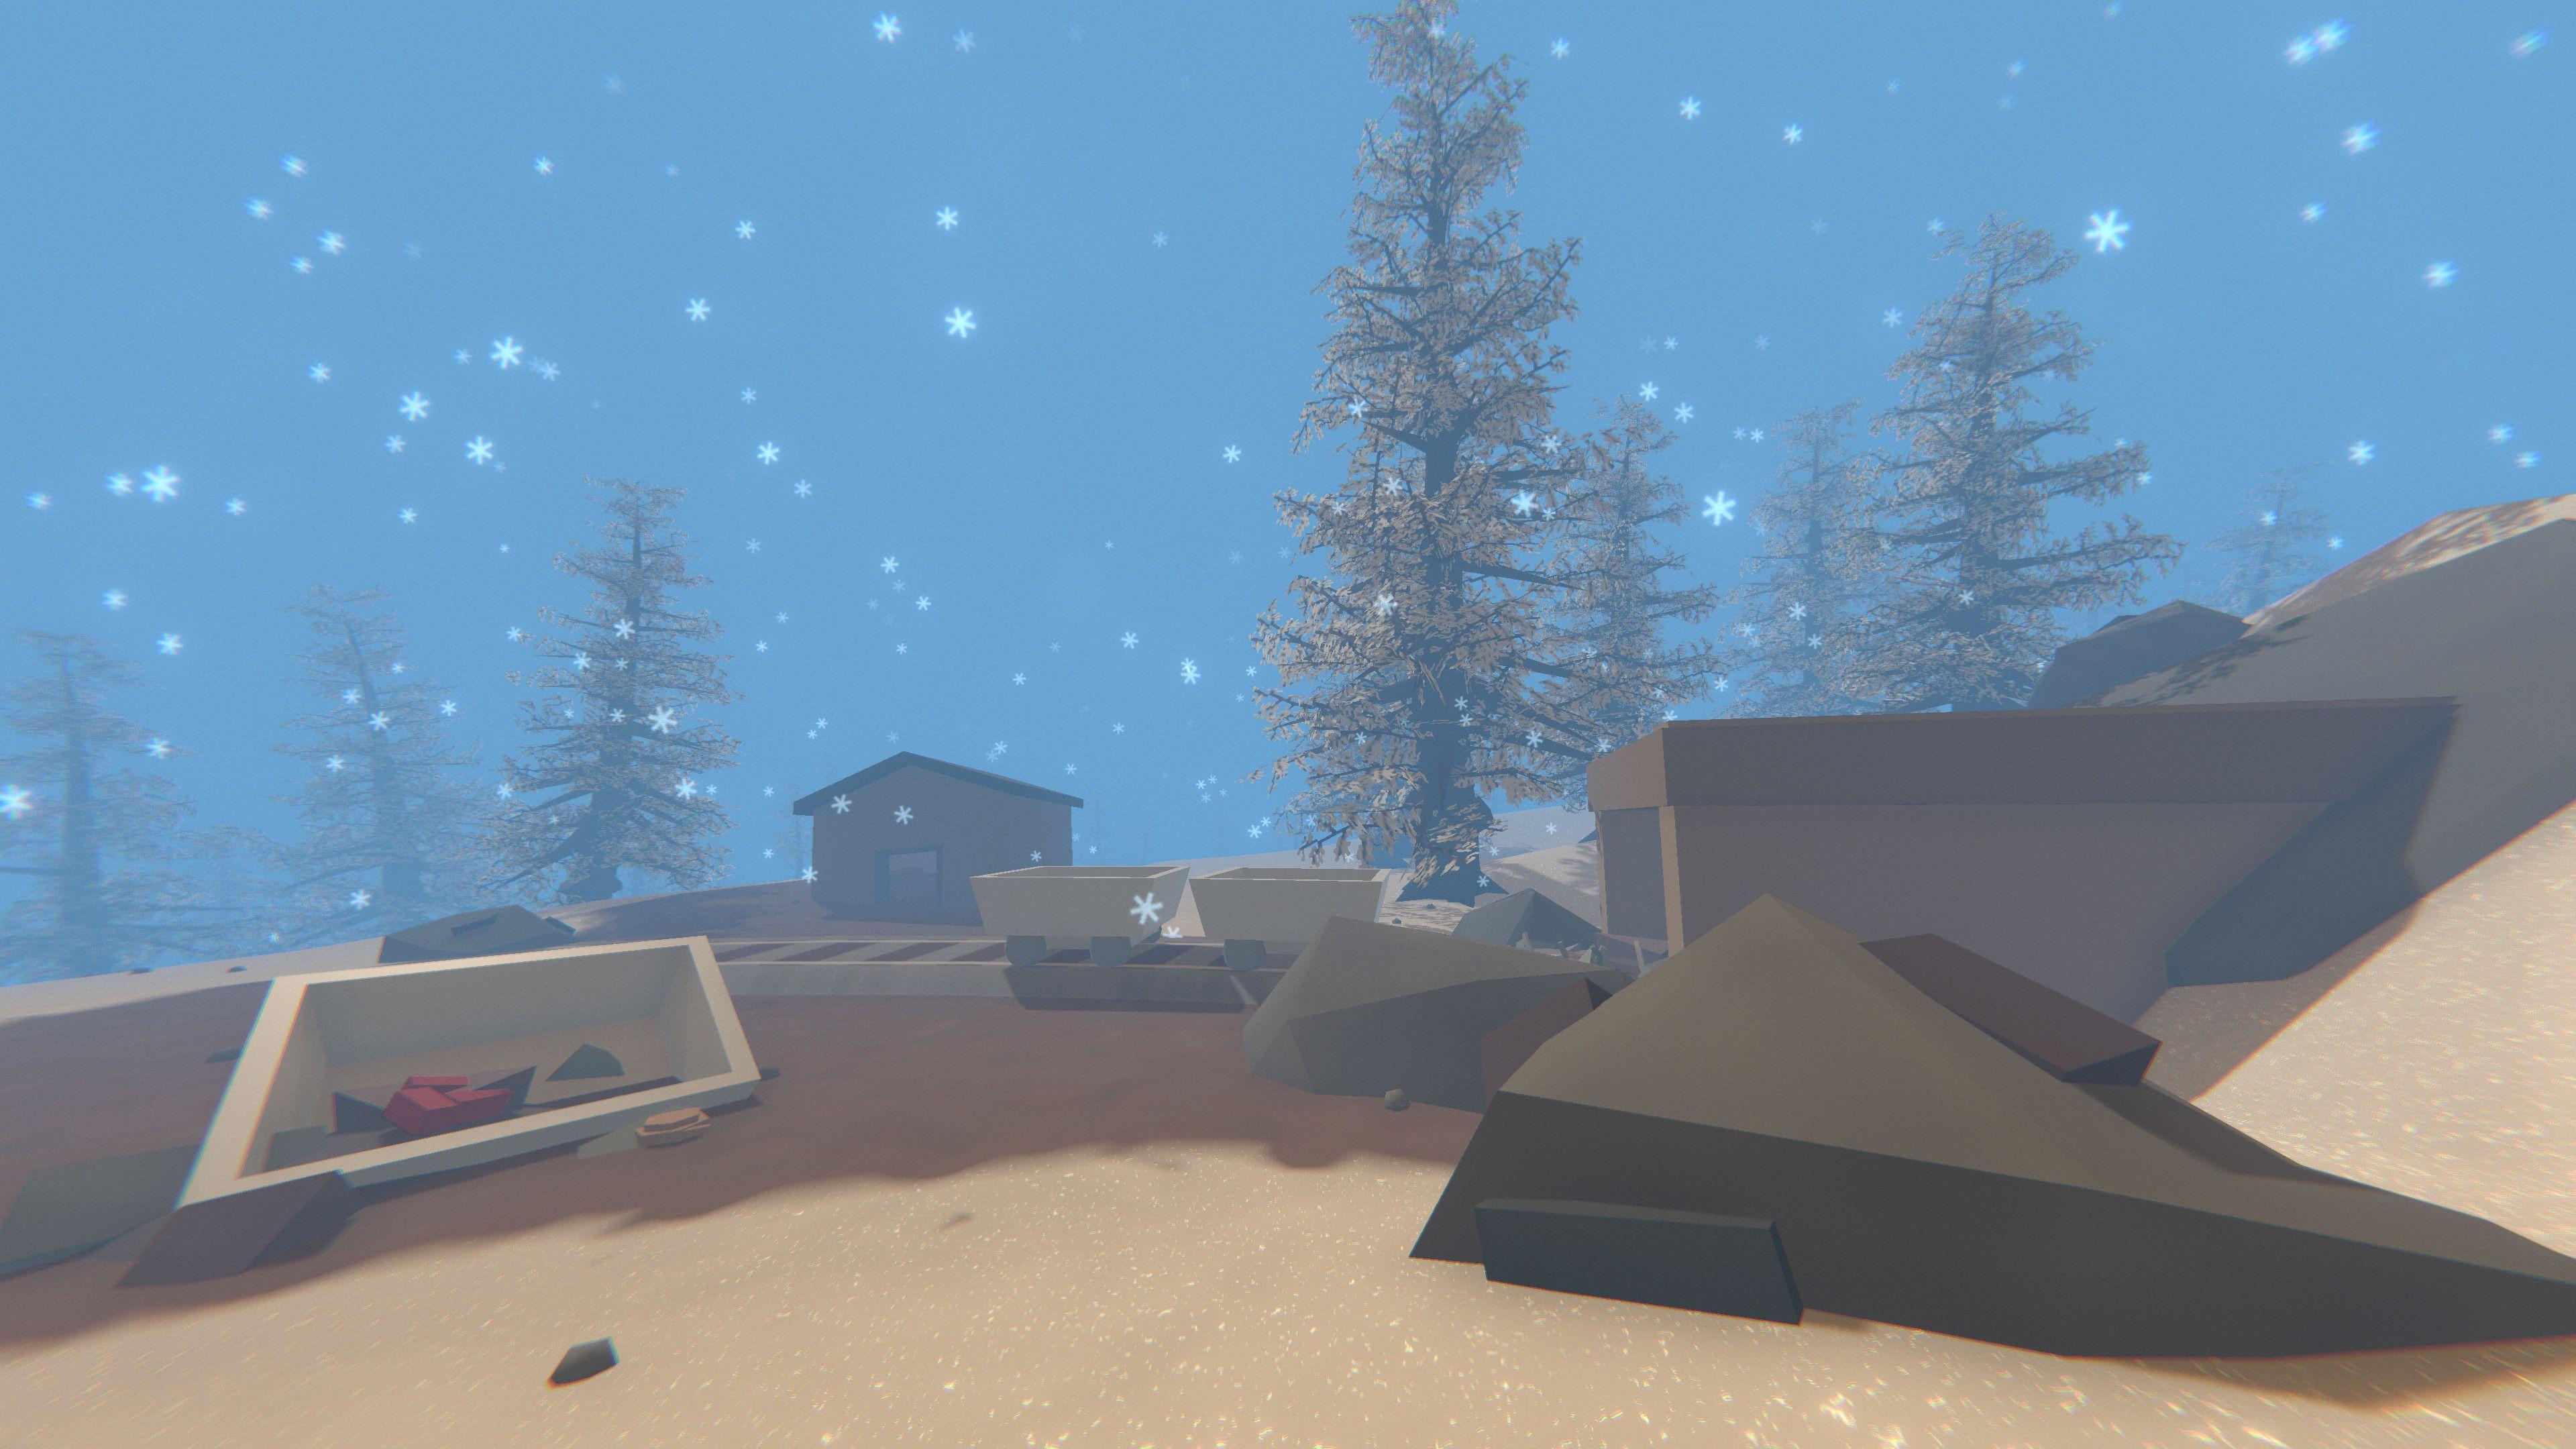 5-gier-podobnych-do-minecraft-unturned-1.jpg